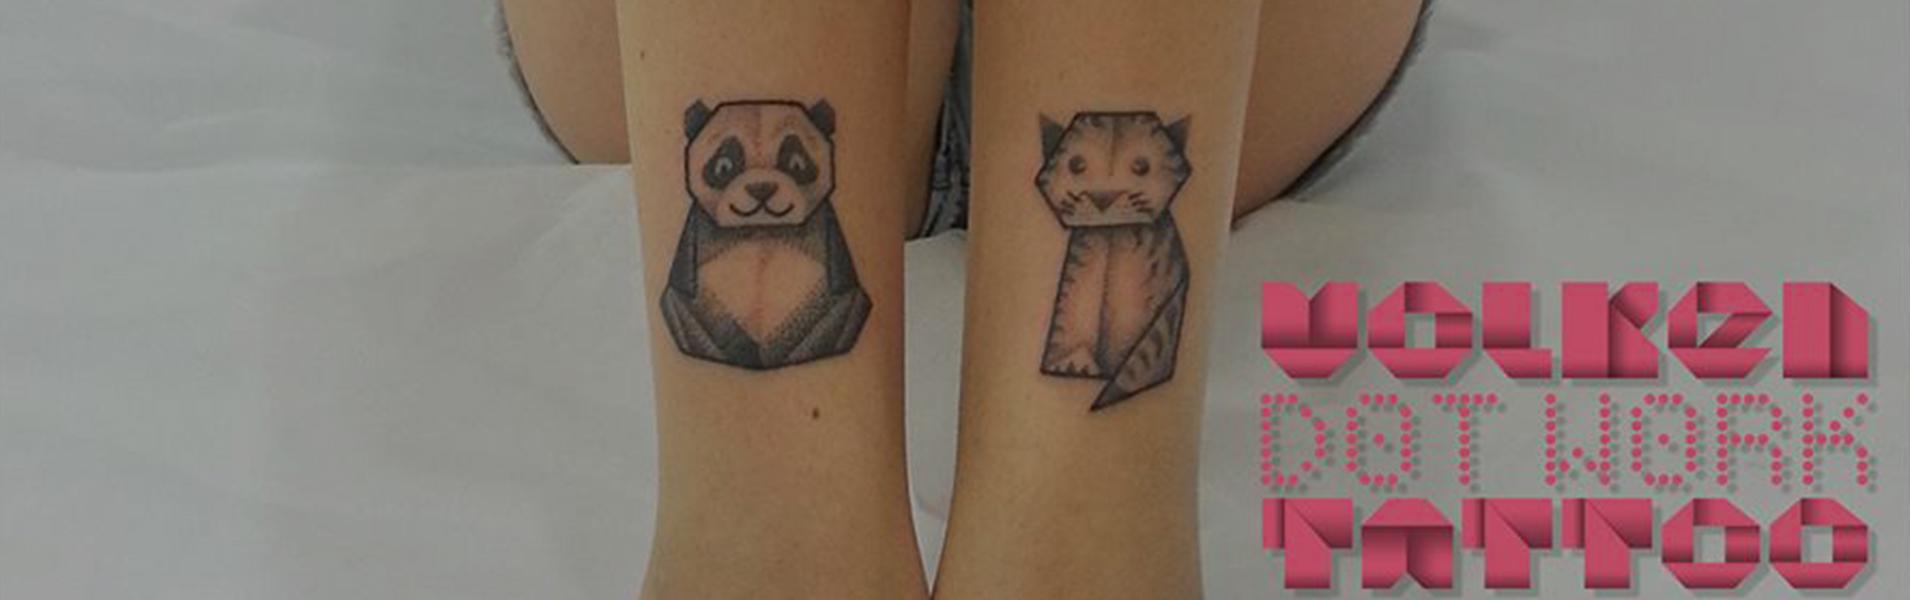 volken tattoo cover